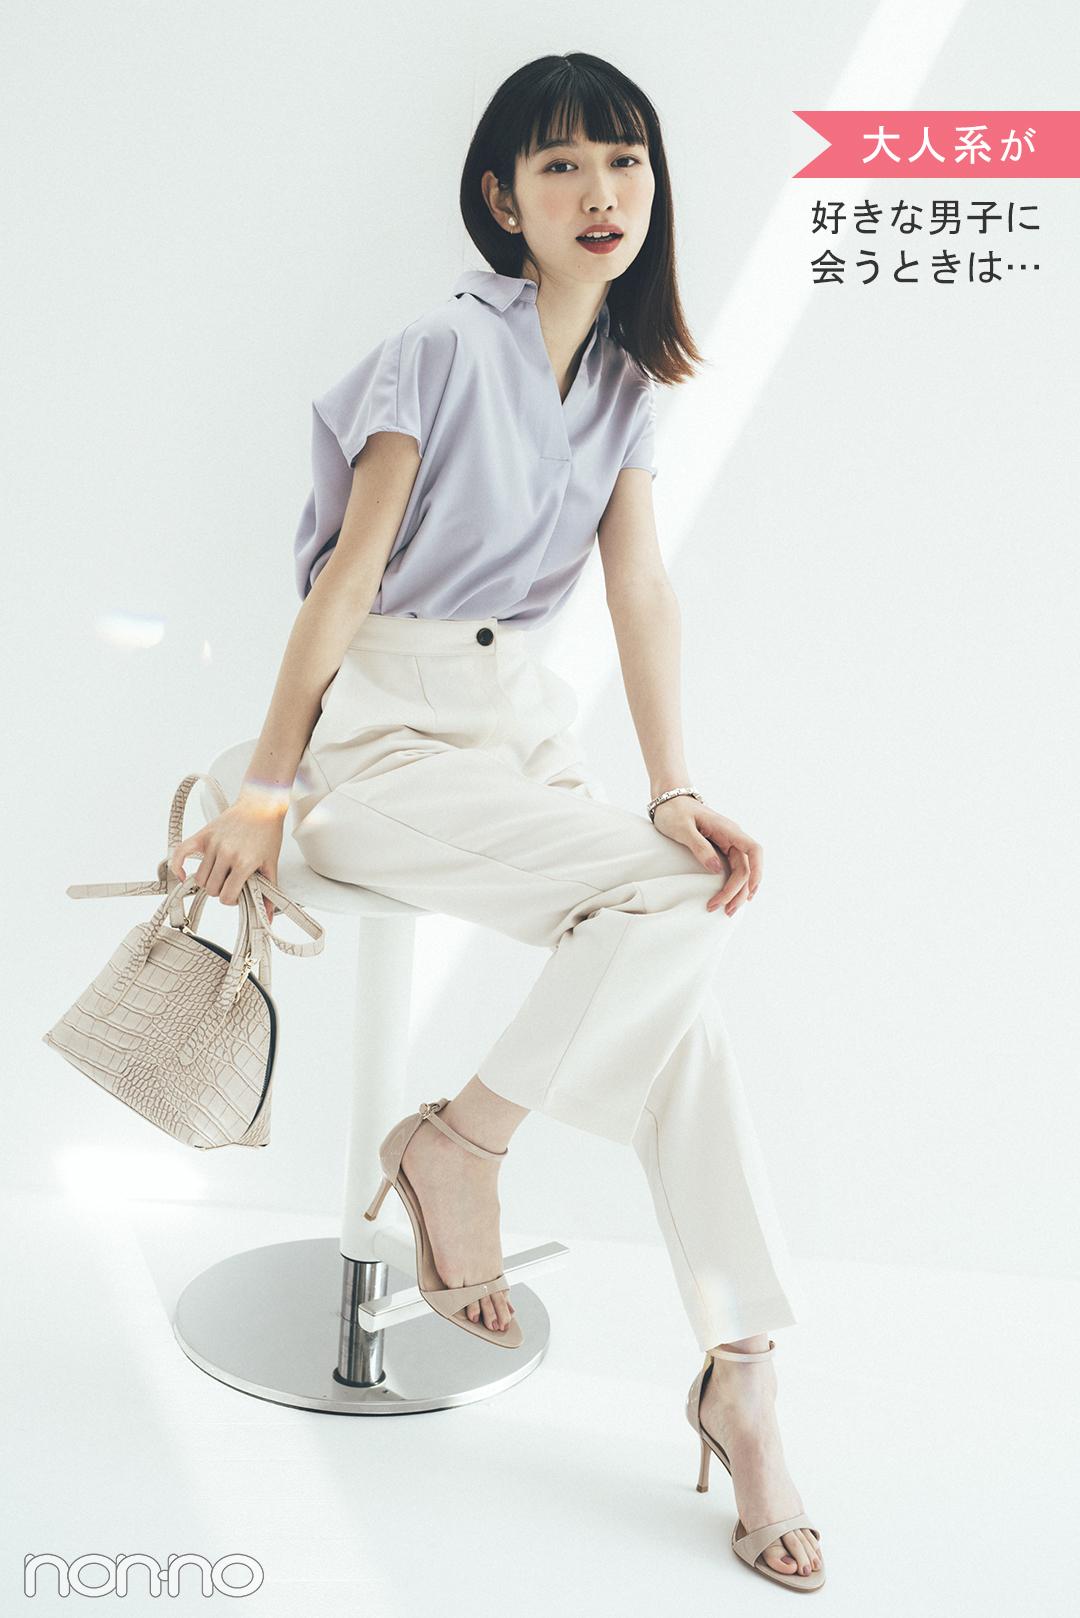 ITEM2 上品な印象に仕上がる スキッパーシャツ 「大人系」が好きな男子に会う時は 岡本夏美